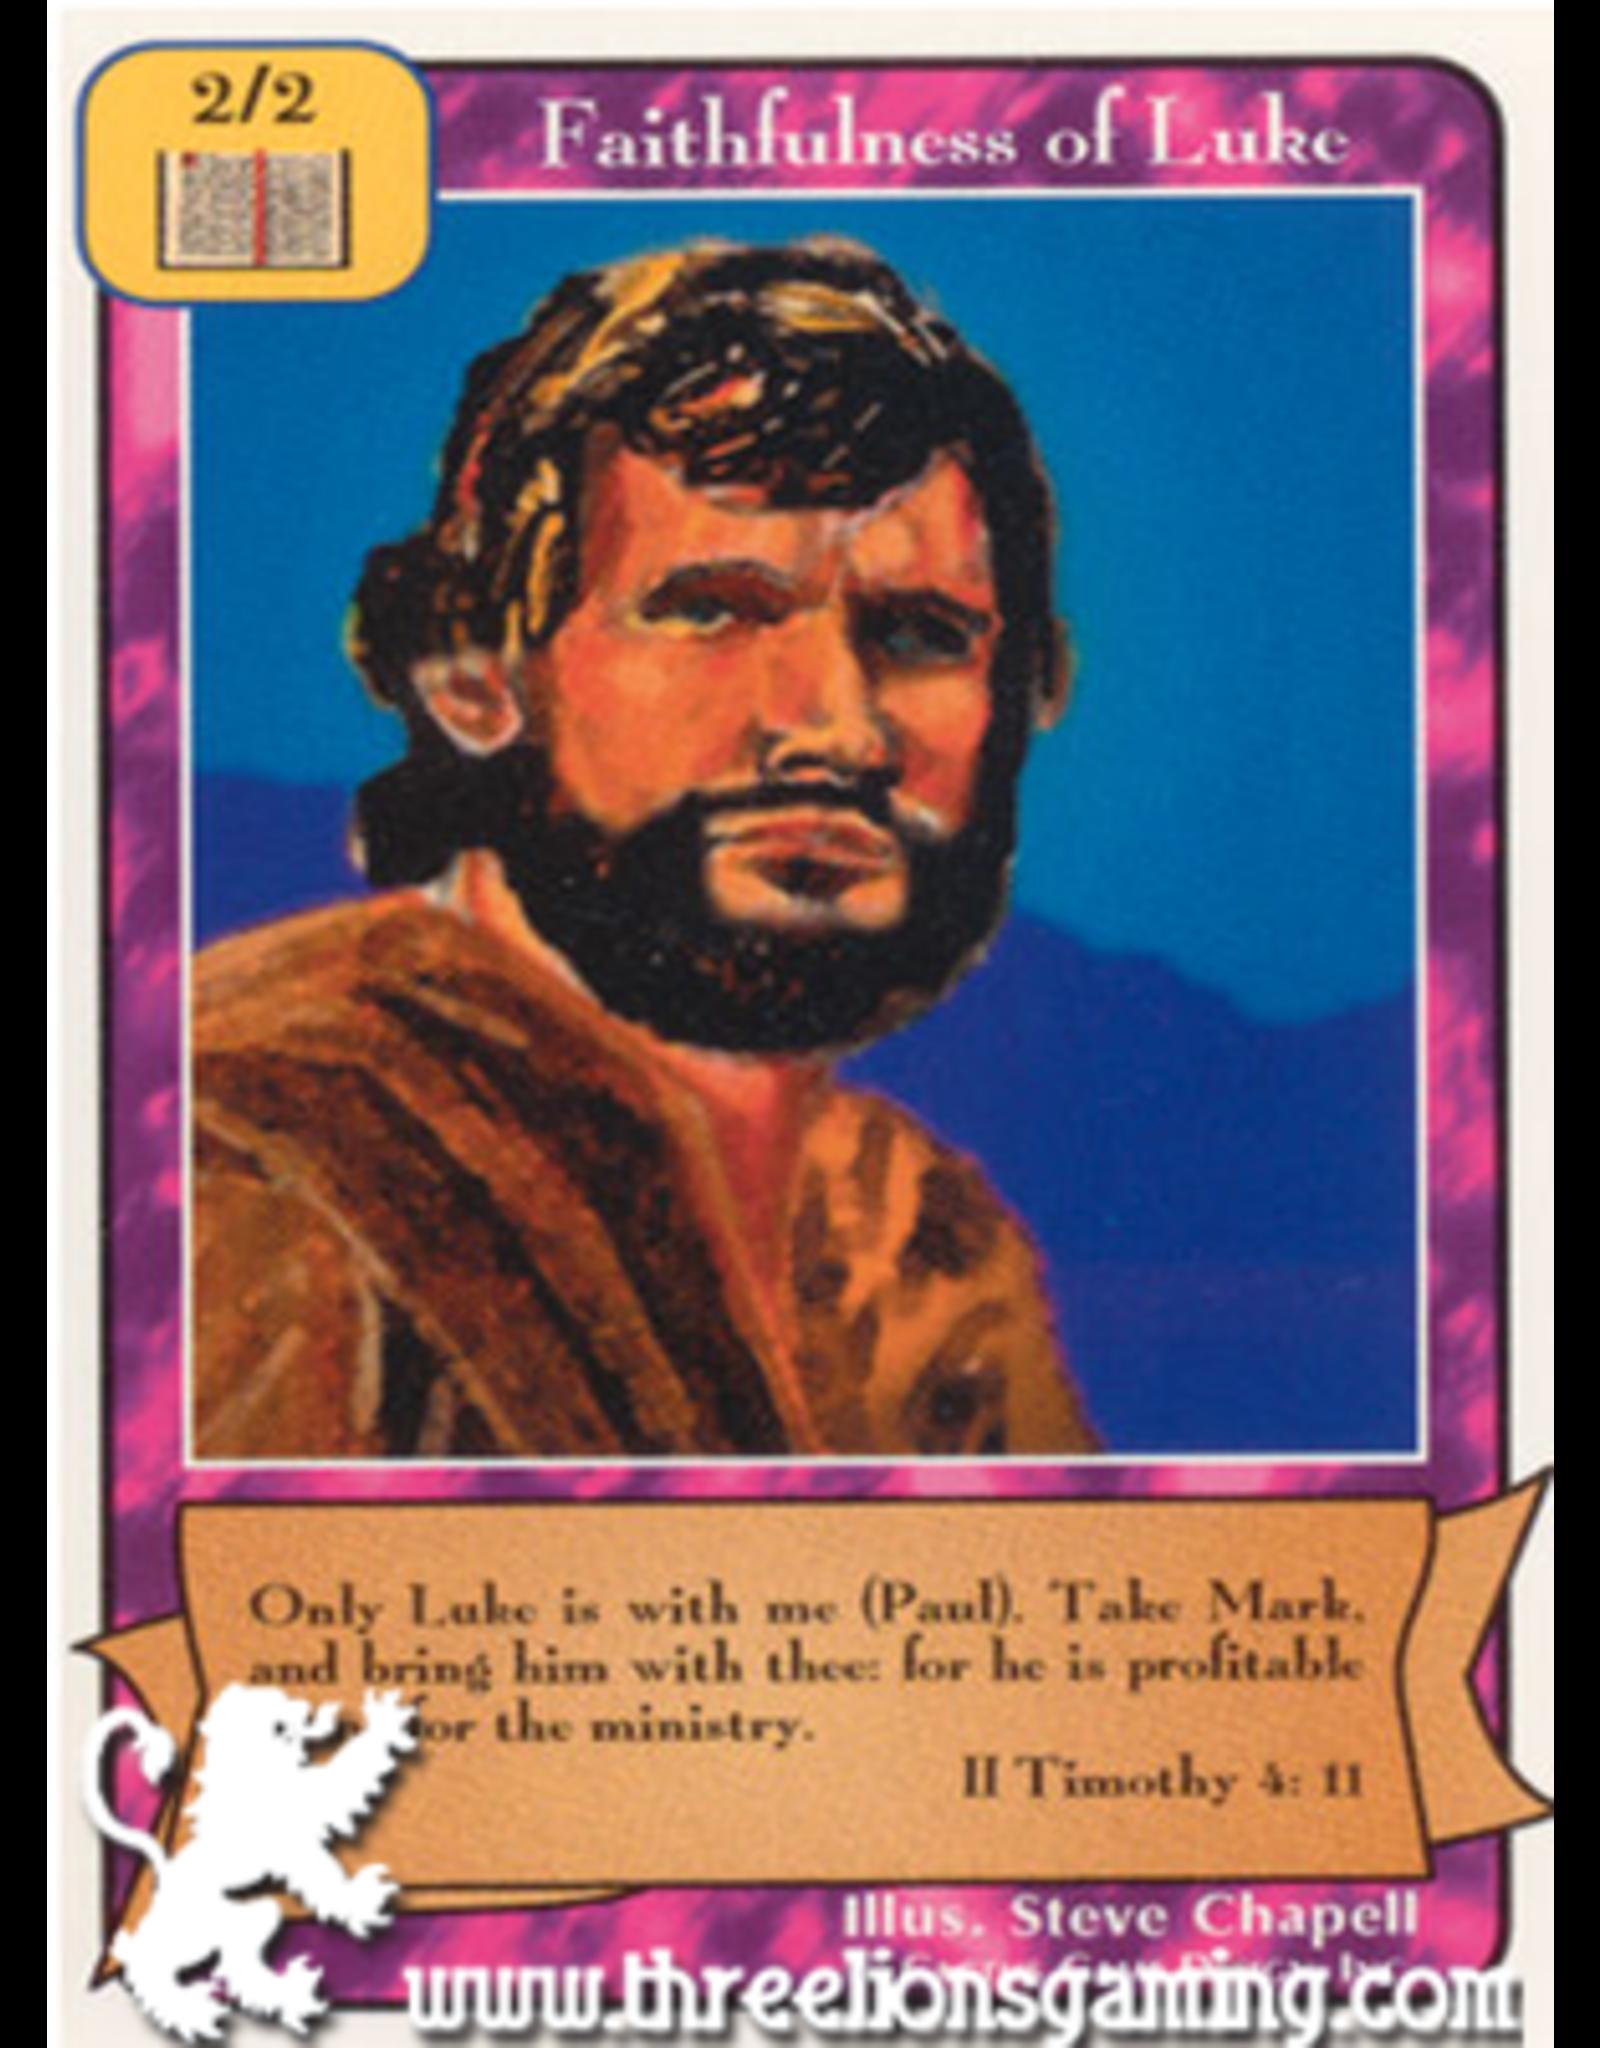 Orig: Faithfulness of Luke